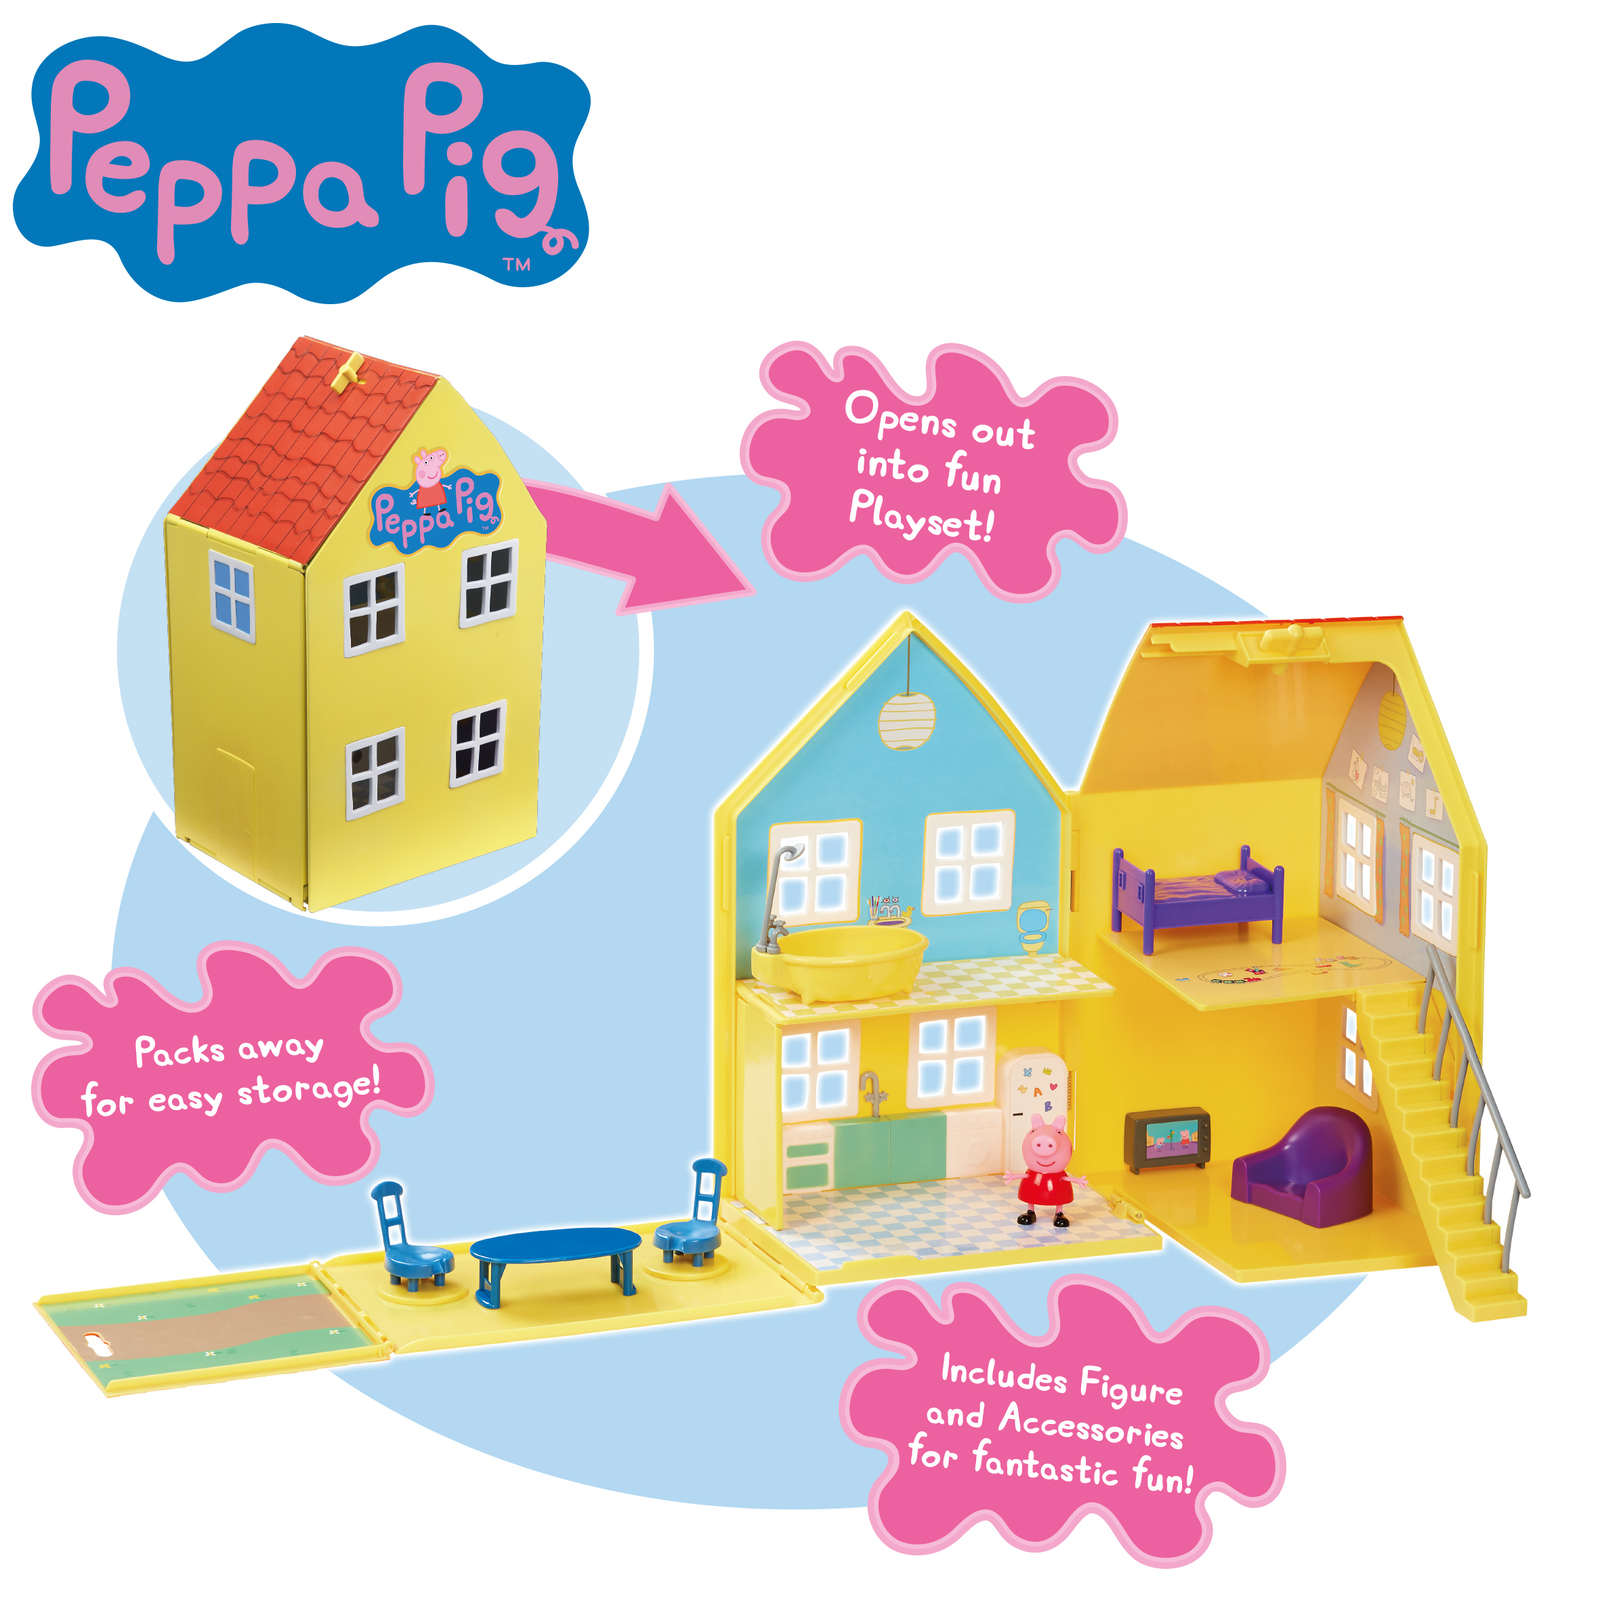 Peppa Pig: Deluxe Playhouse - Playset image